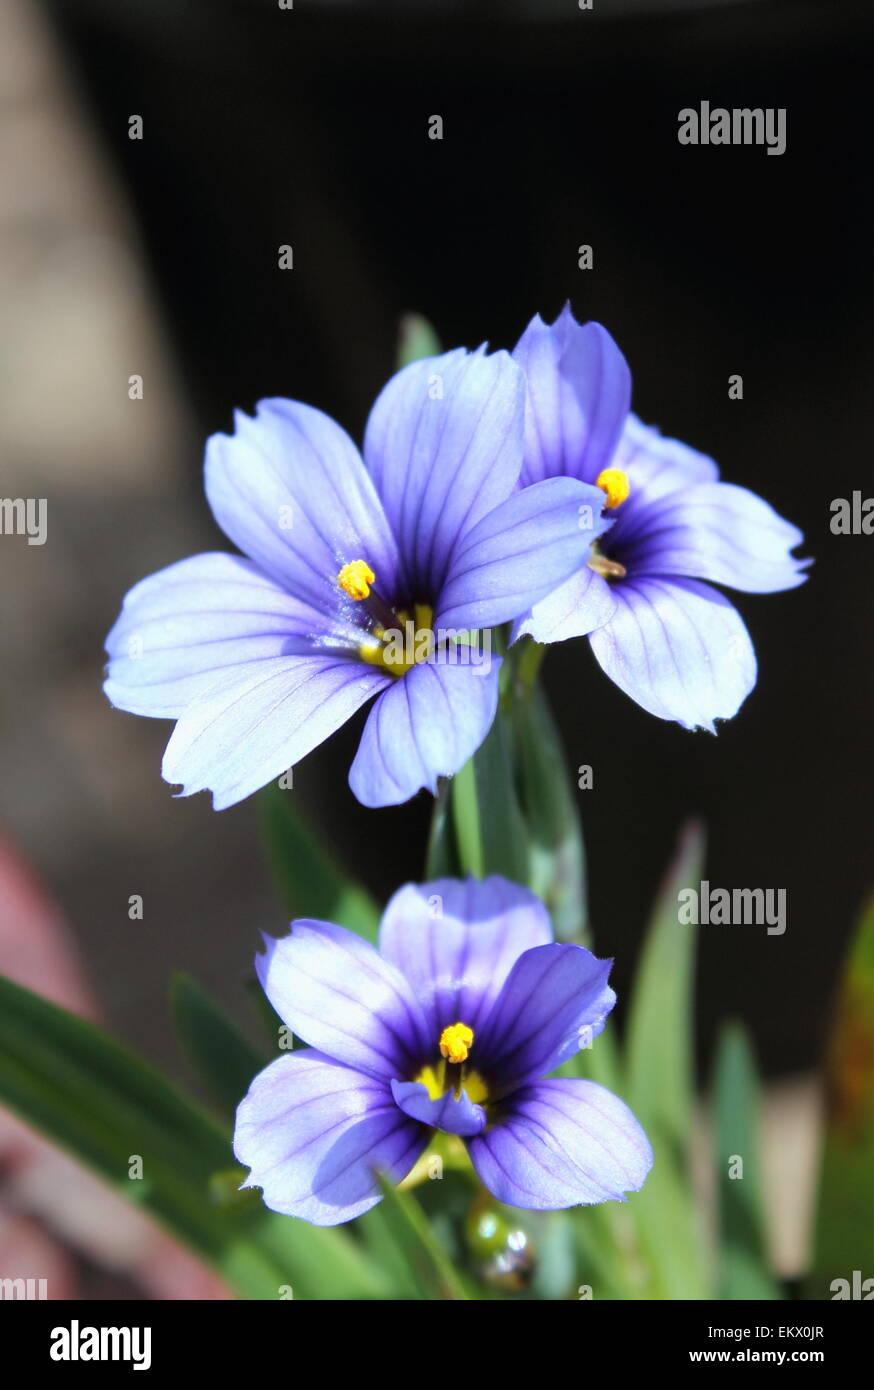 Sisyrinchium 'Californian Skies' - Stock Image